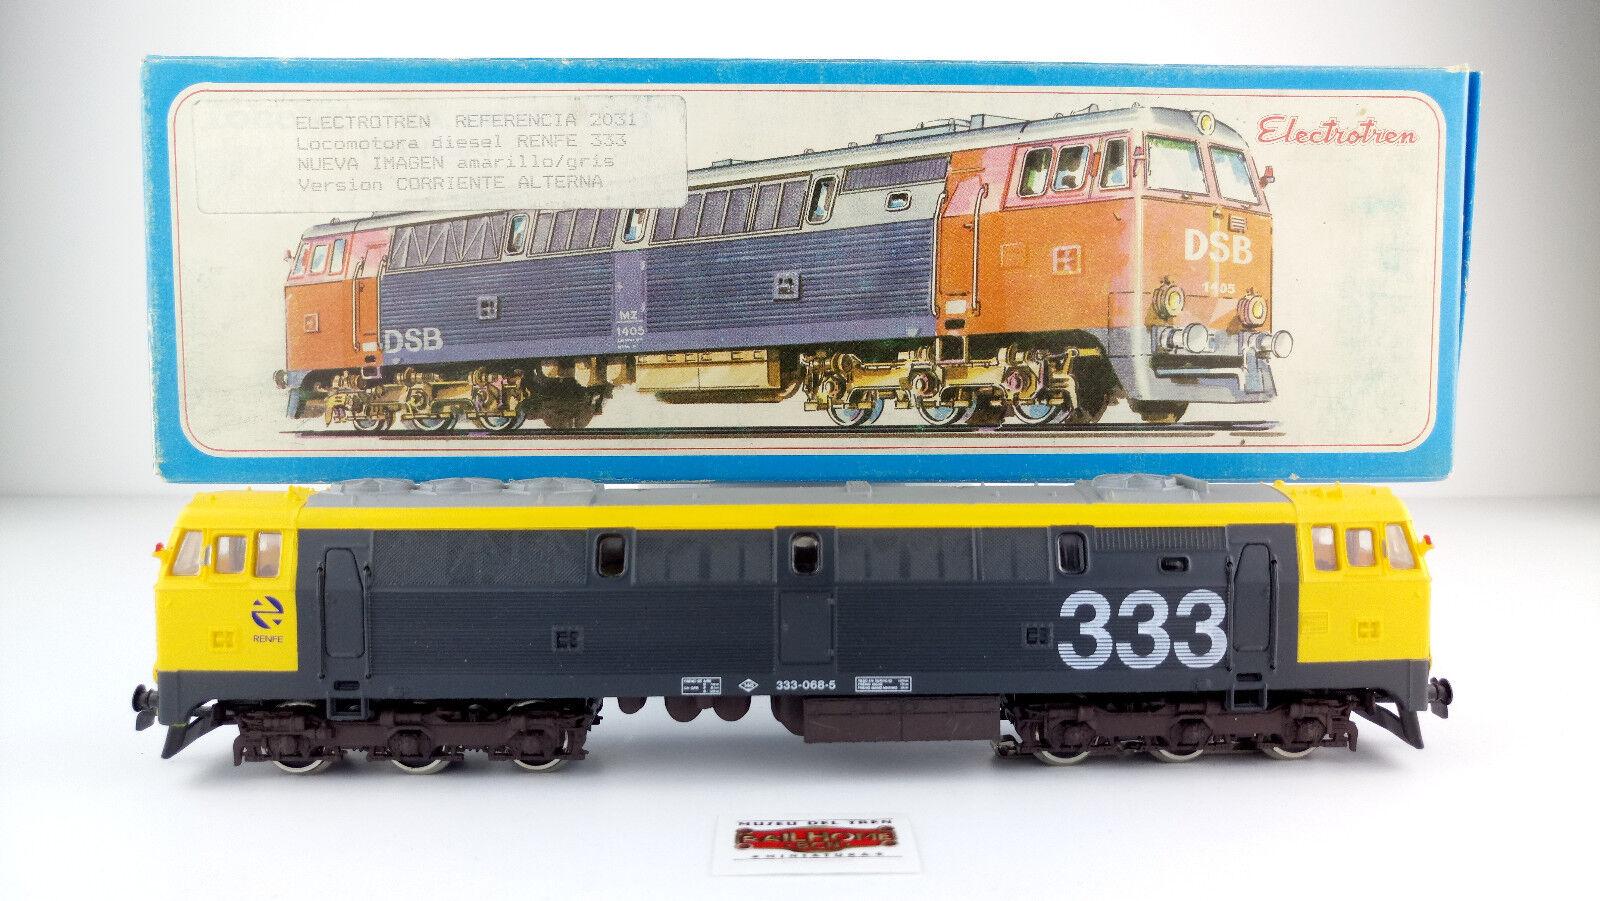 Electrödren H0 2031 - Diesel Locomotive Renfe 333 - Ac - DCC - ny - Ovp